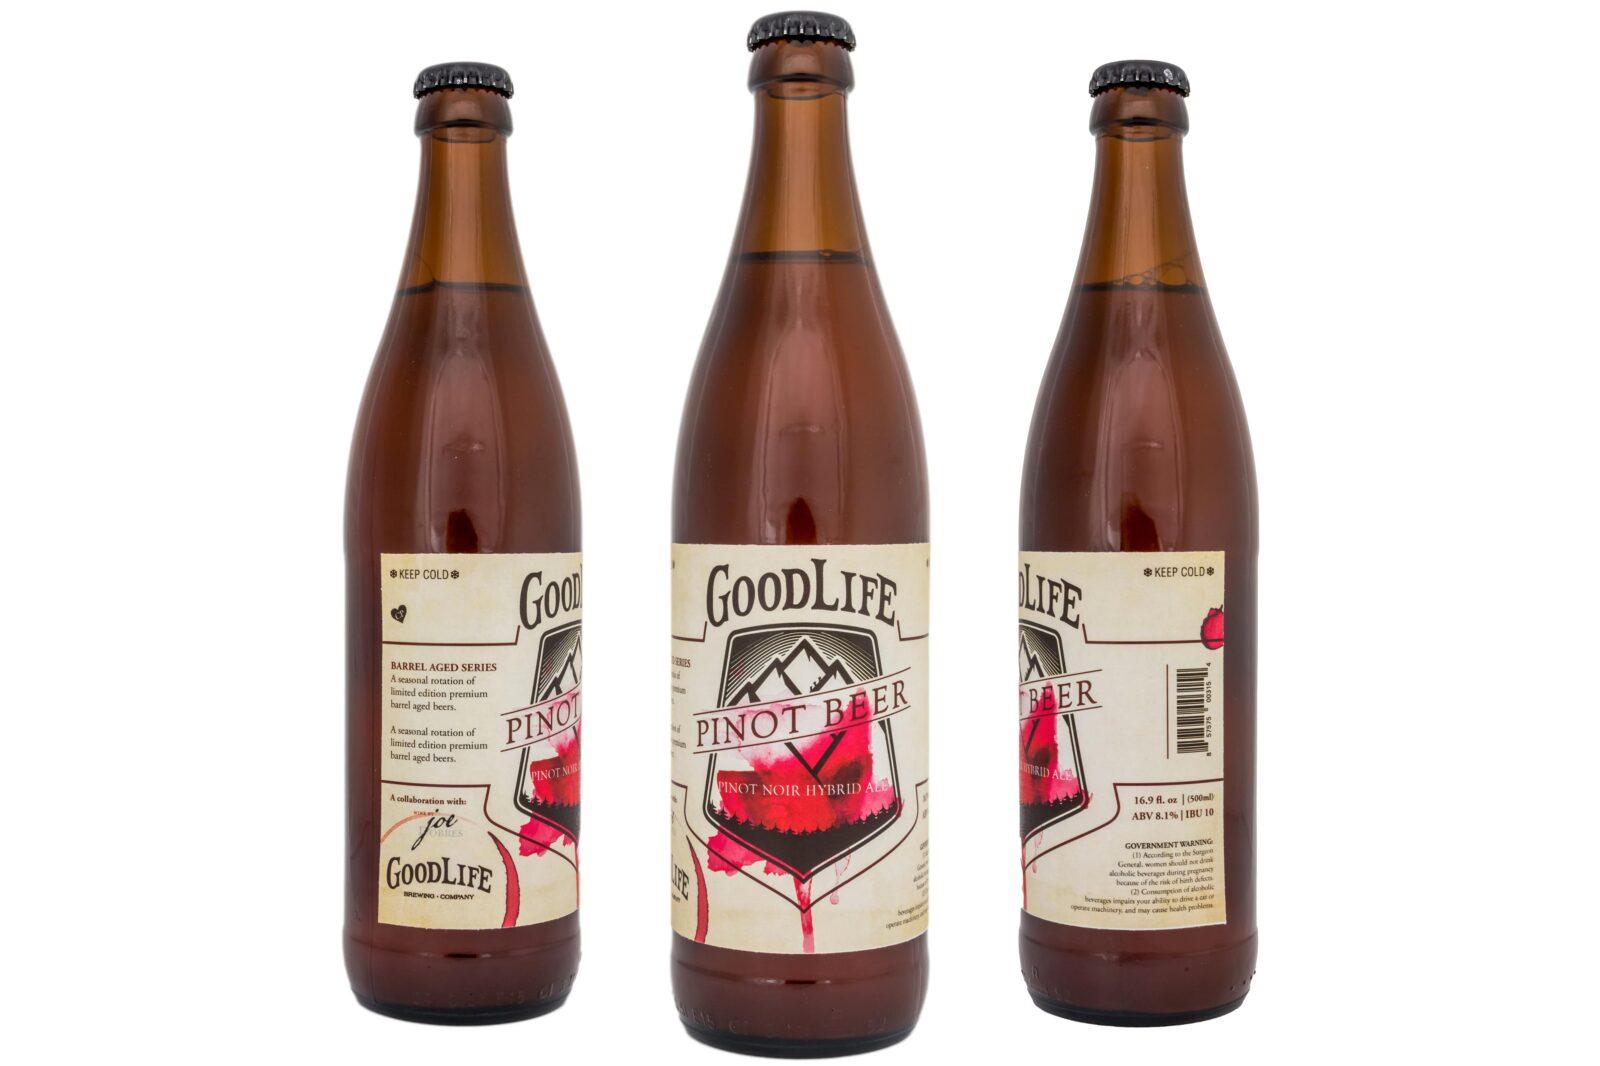 Crowerks designed original artwork for GoodLife's Pinot Noir Hybrid Ale 16.9oz glass bottle label.